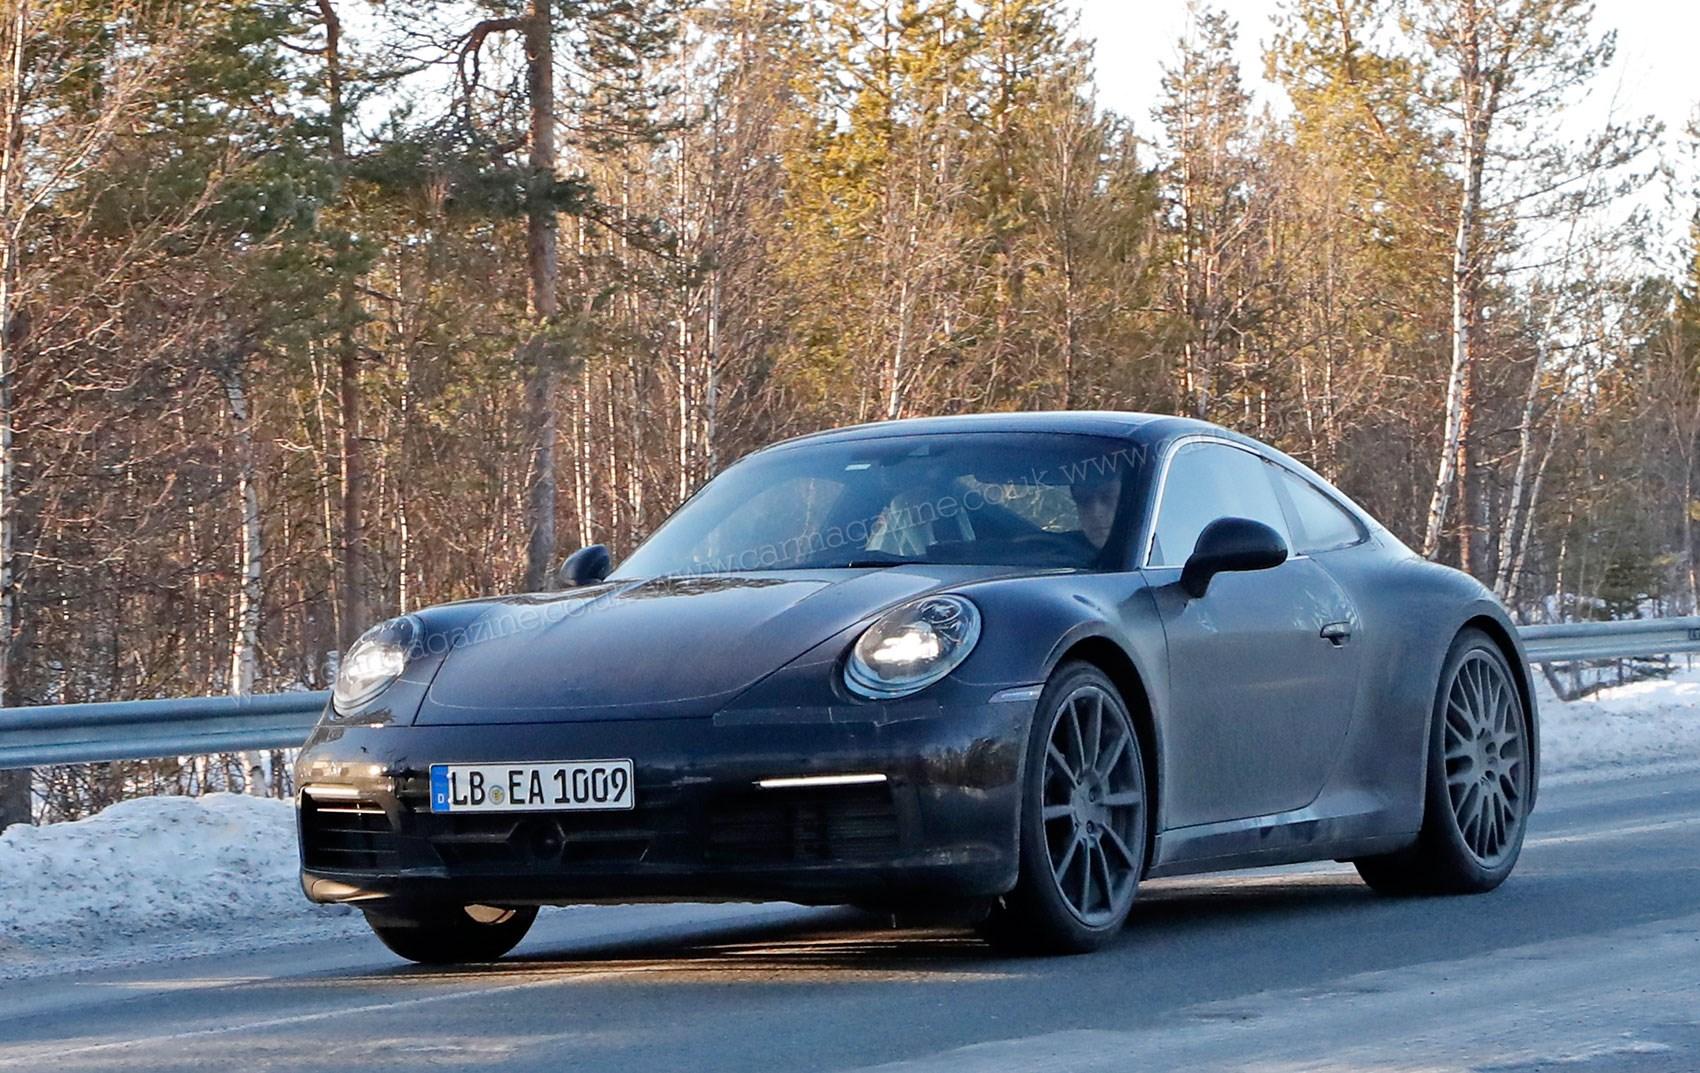 Porsche 911 992 Generation Spy Shots And First Details By Car Magazine